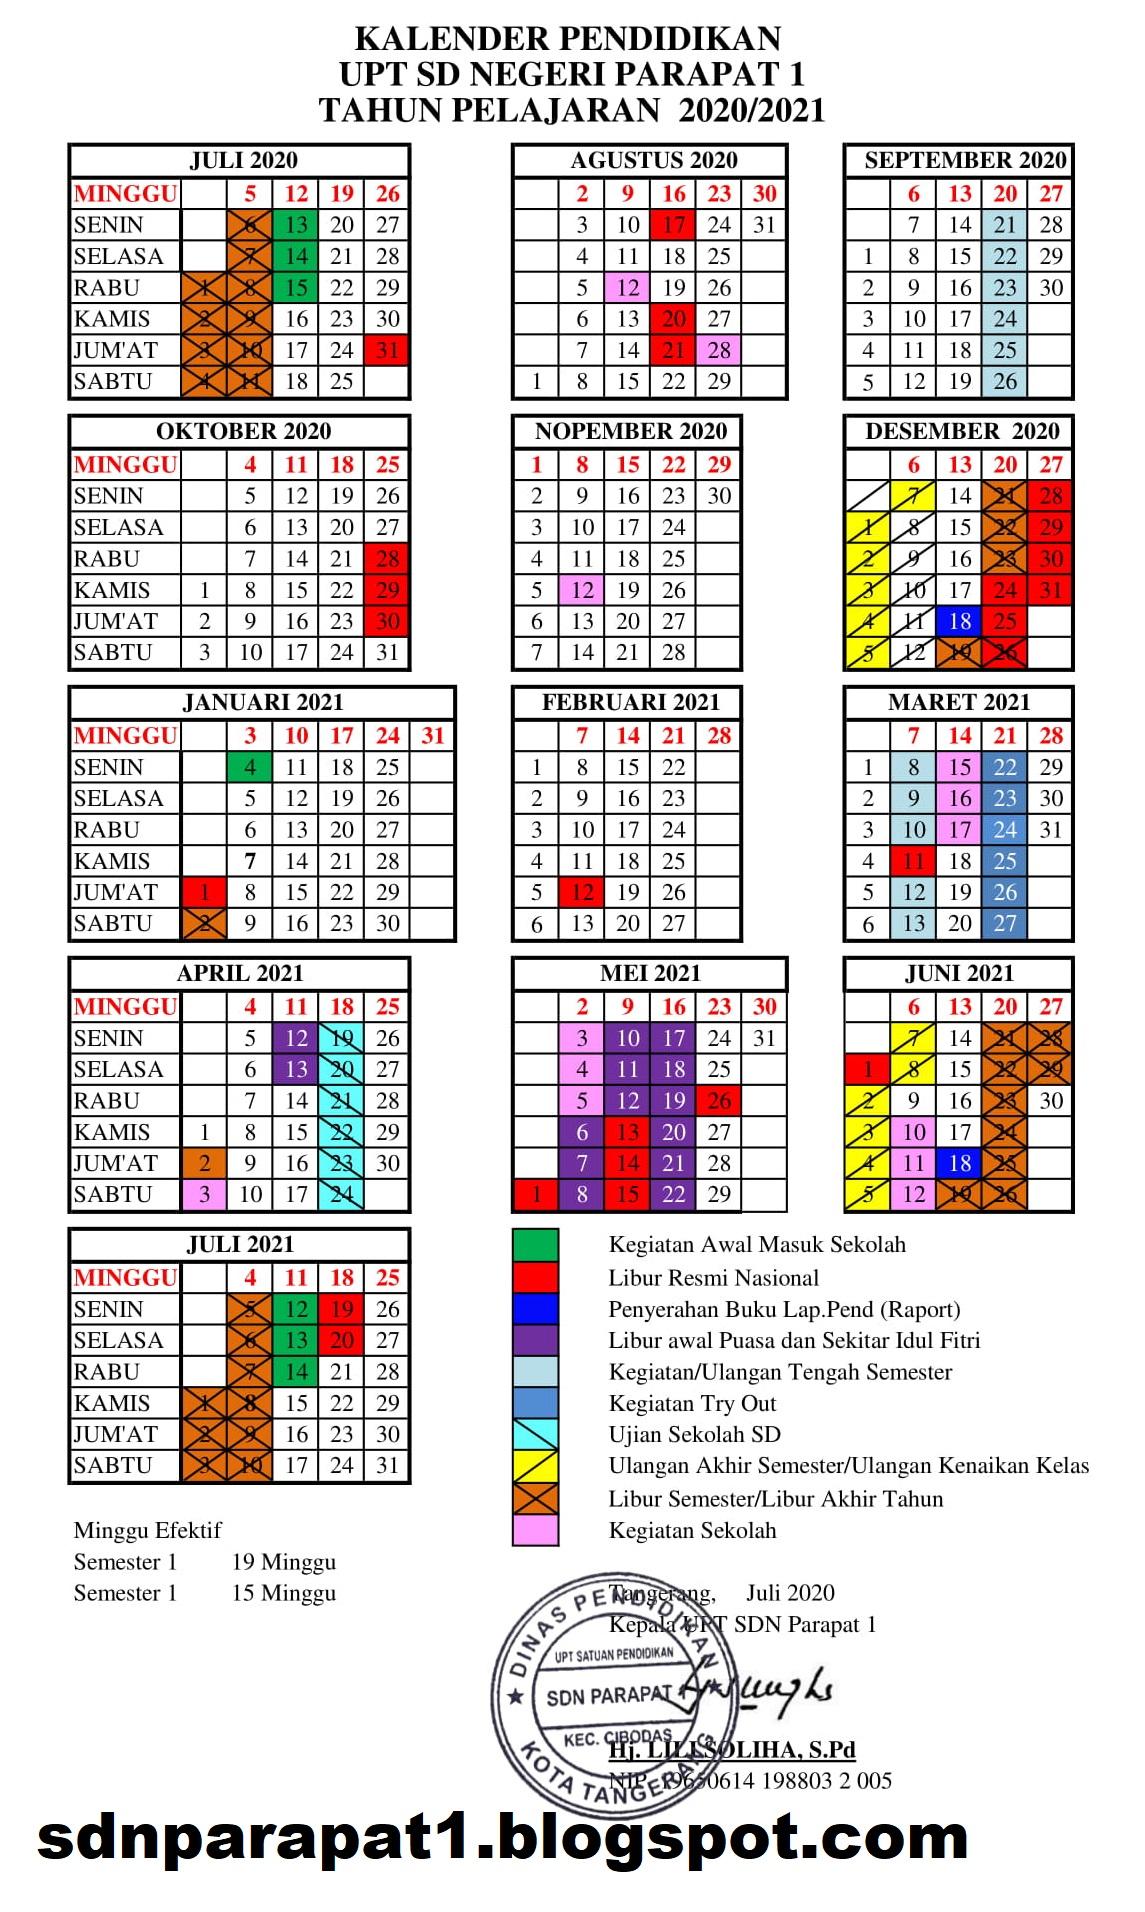 SDN PARAPAT 1: Kalender Pendidikan Tahun Pelajaran 2020 ...